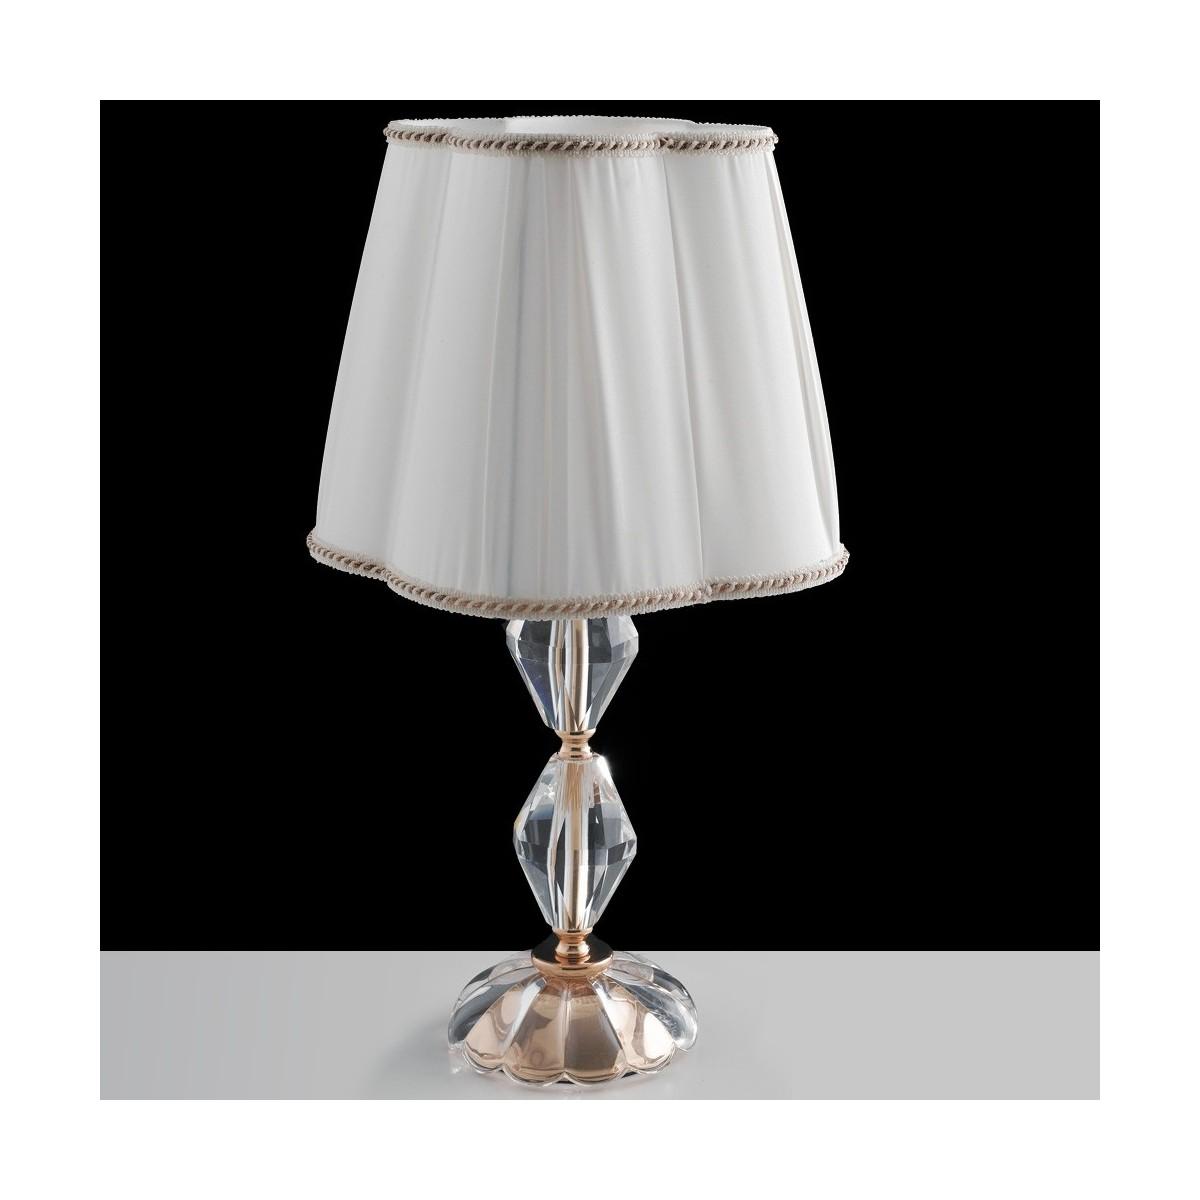 I RIFLESSOL1 Lume Cristallo Finiture Cromo paralume Tessuto Lampada Classica E14